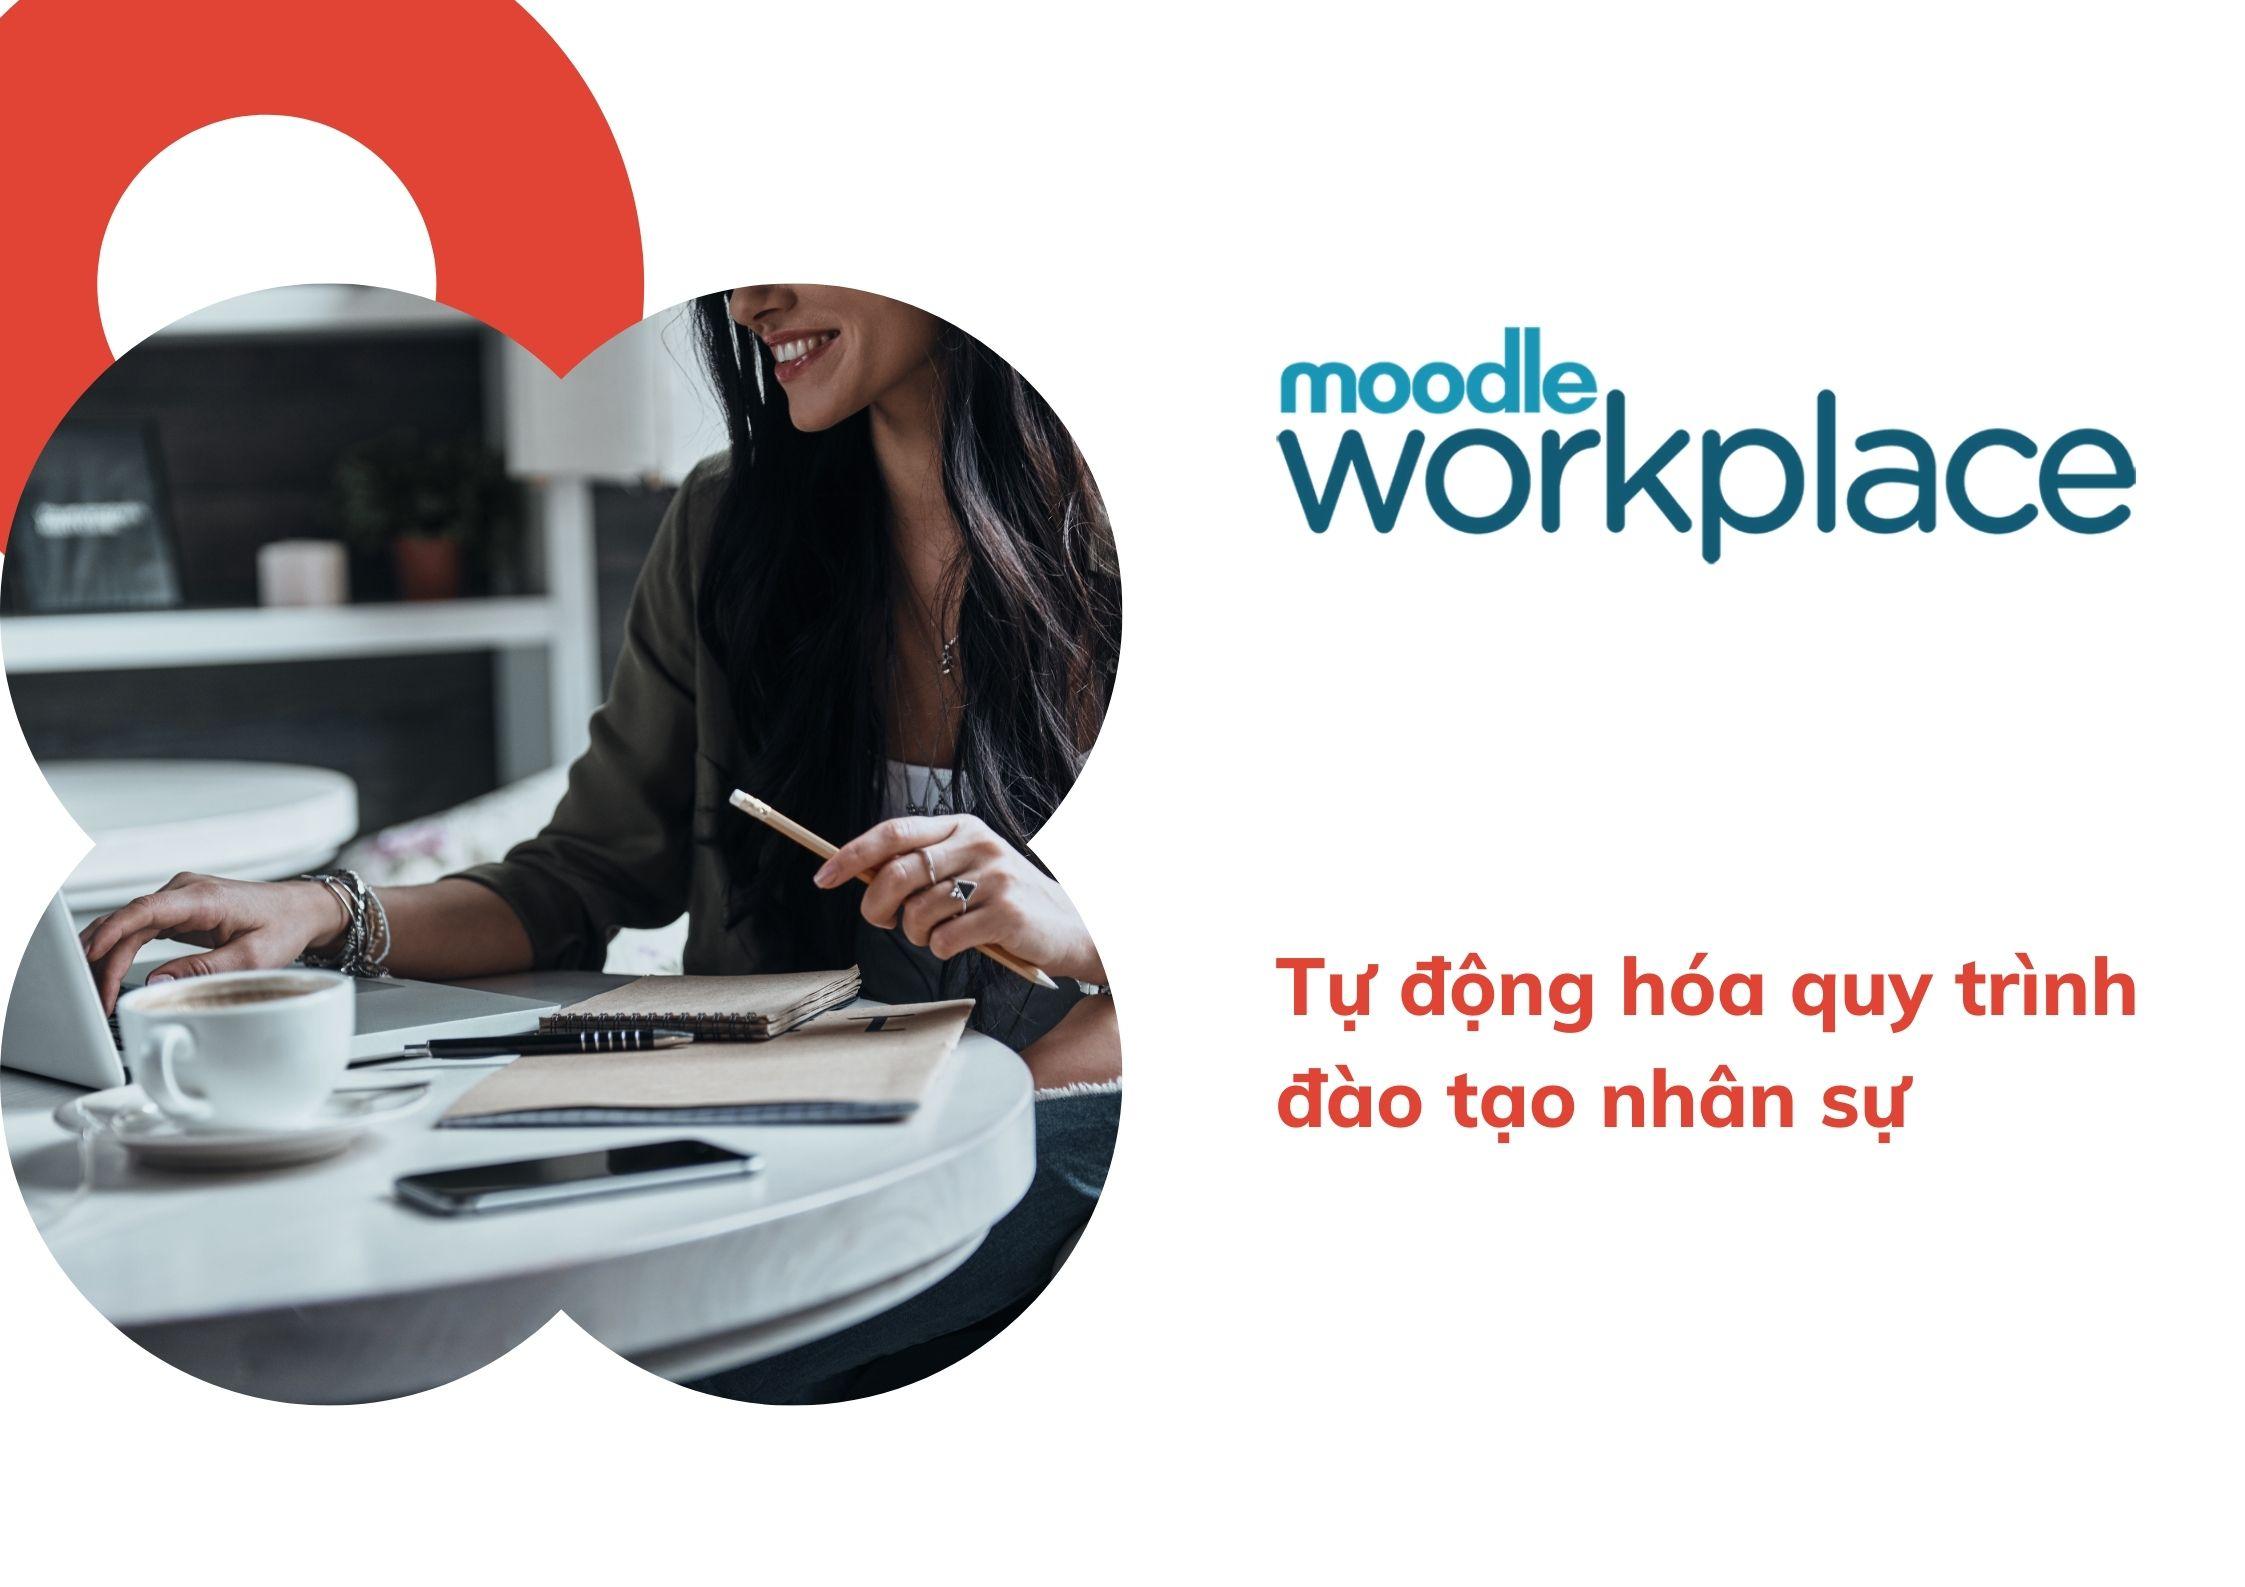 linedu-moodle-workplace